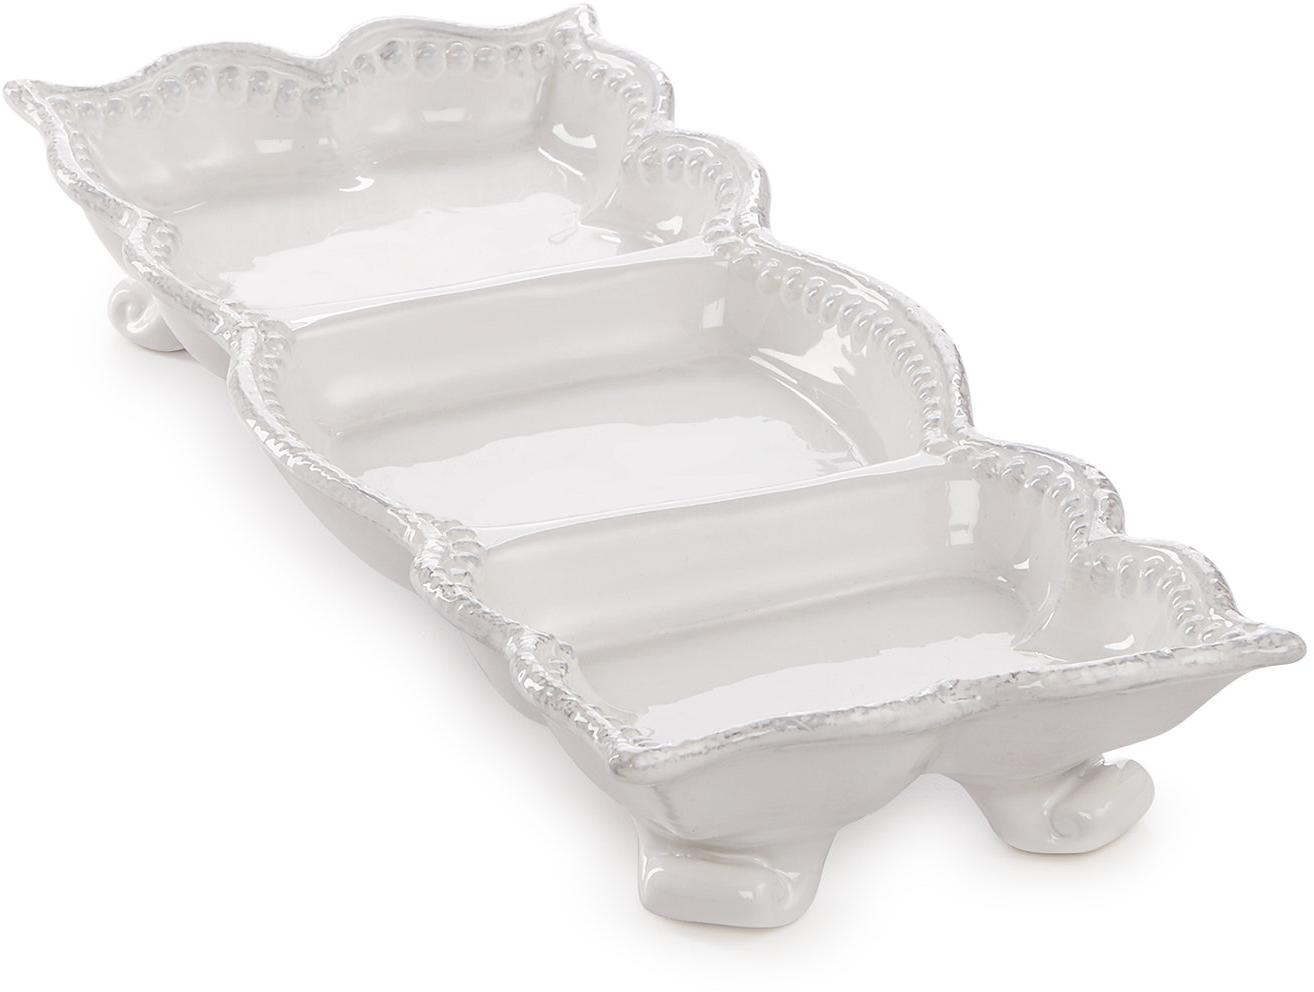 Maison versailles blanc divided relish dish serveware dining entertaining macy s bridal and